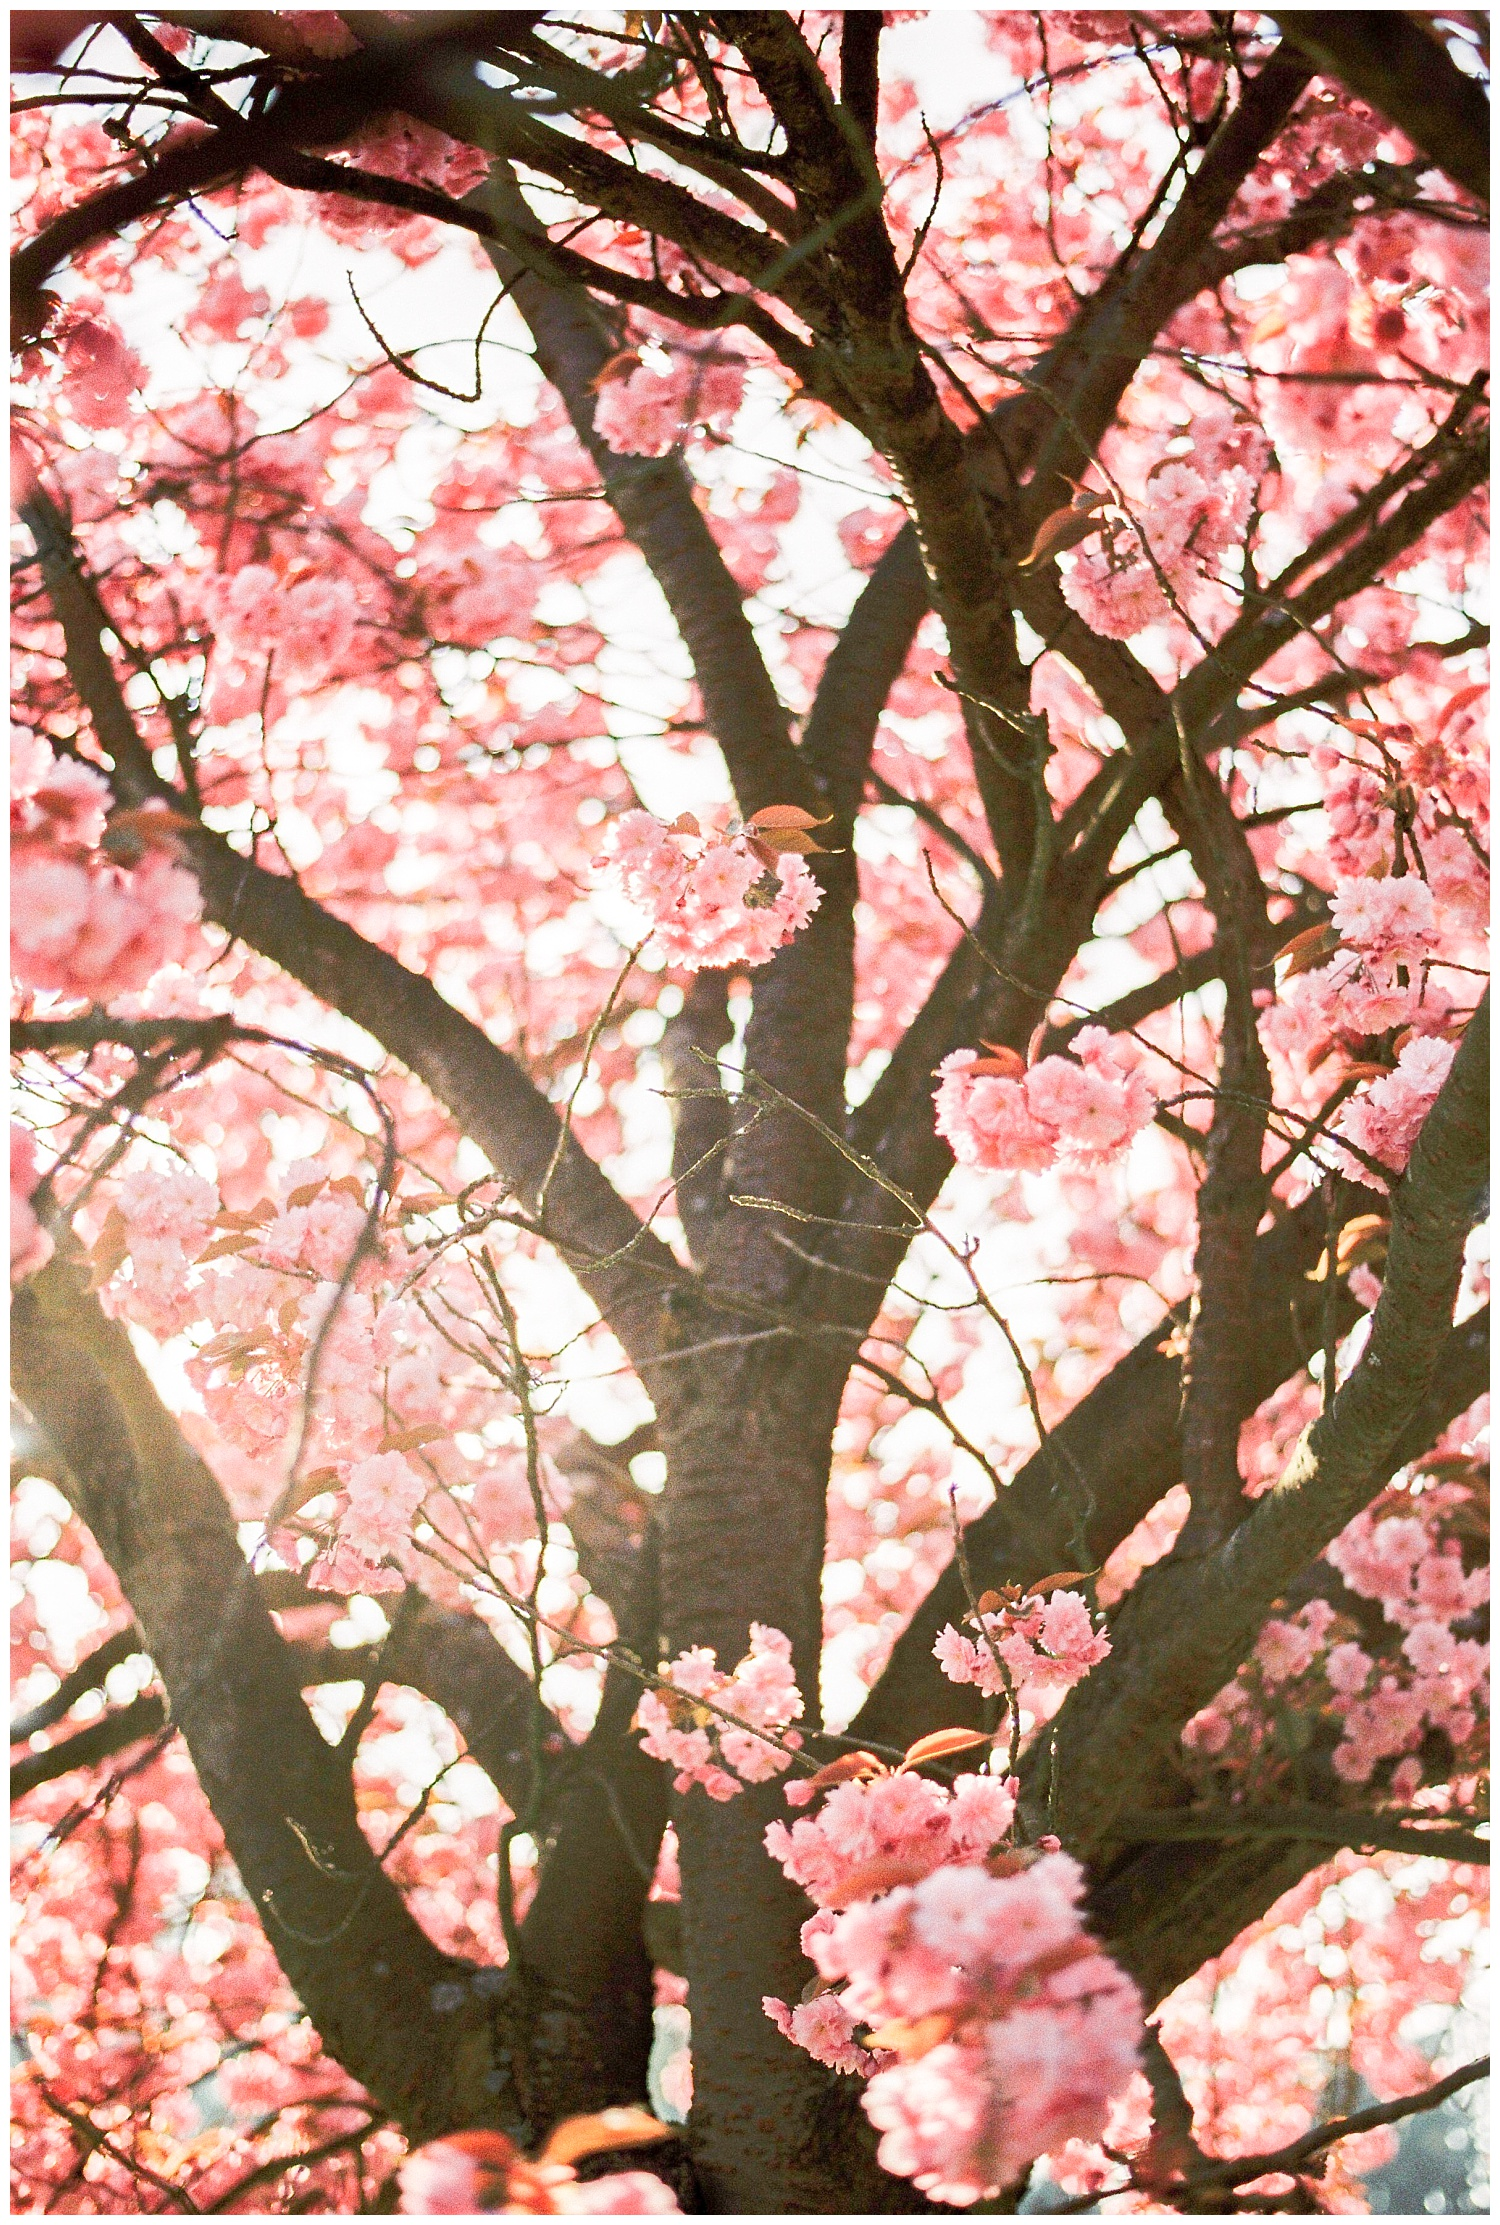 Spring_Gaetan_Jargot_0001.jpg